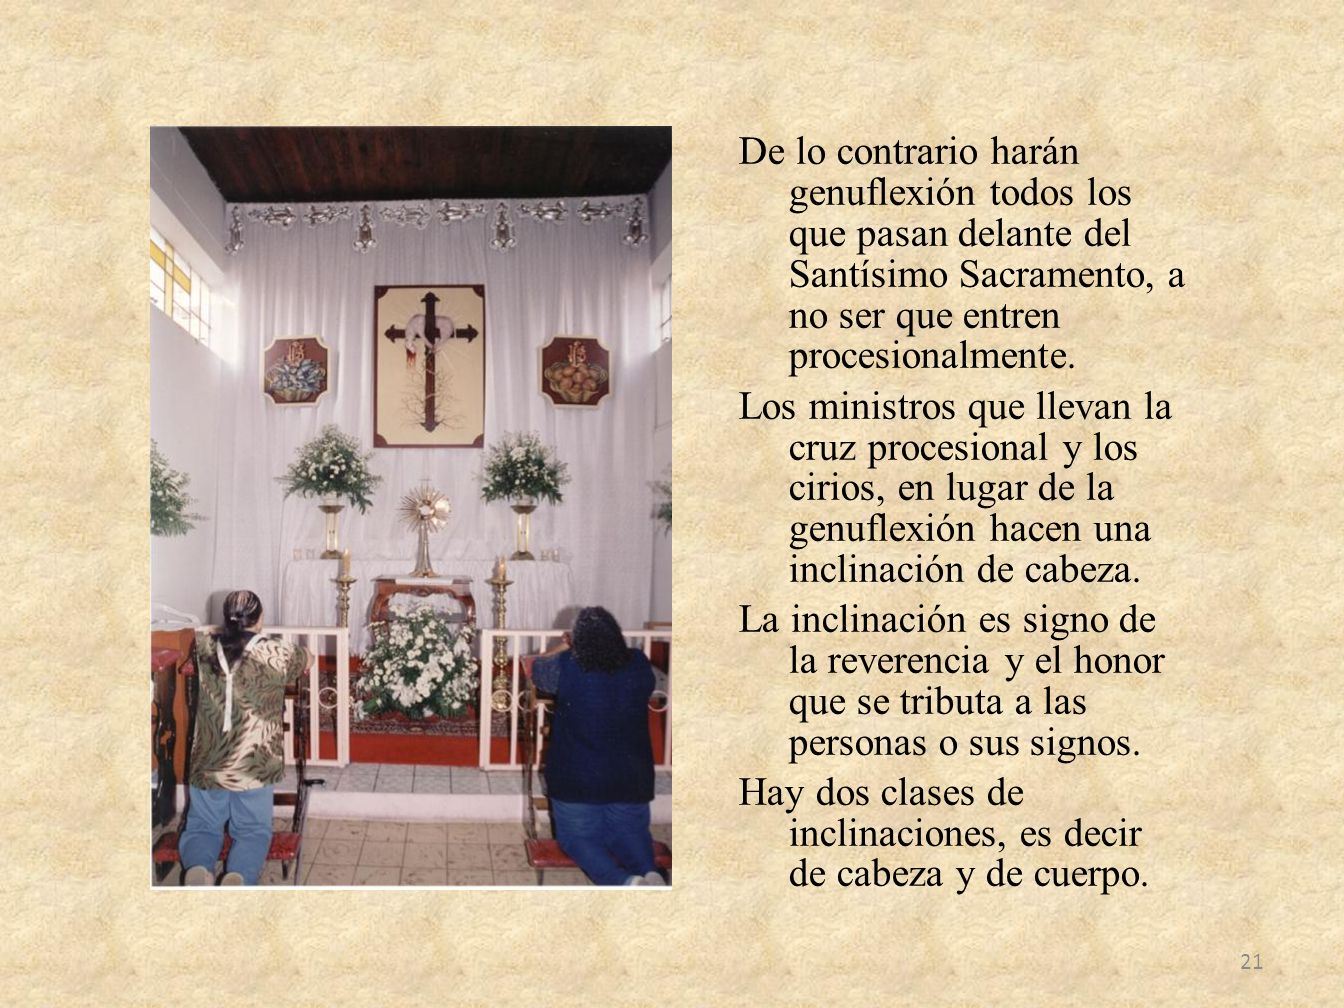 De lo contrario harán genuflexión todos los que pasan delante del Santísimo Sacramento, a no ser que entren procesionalmente.